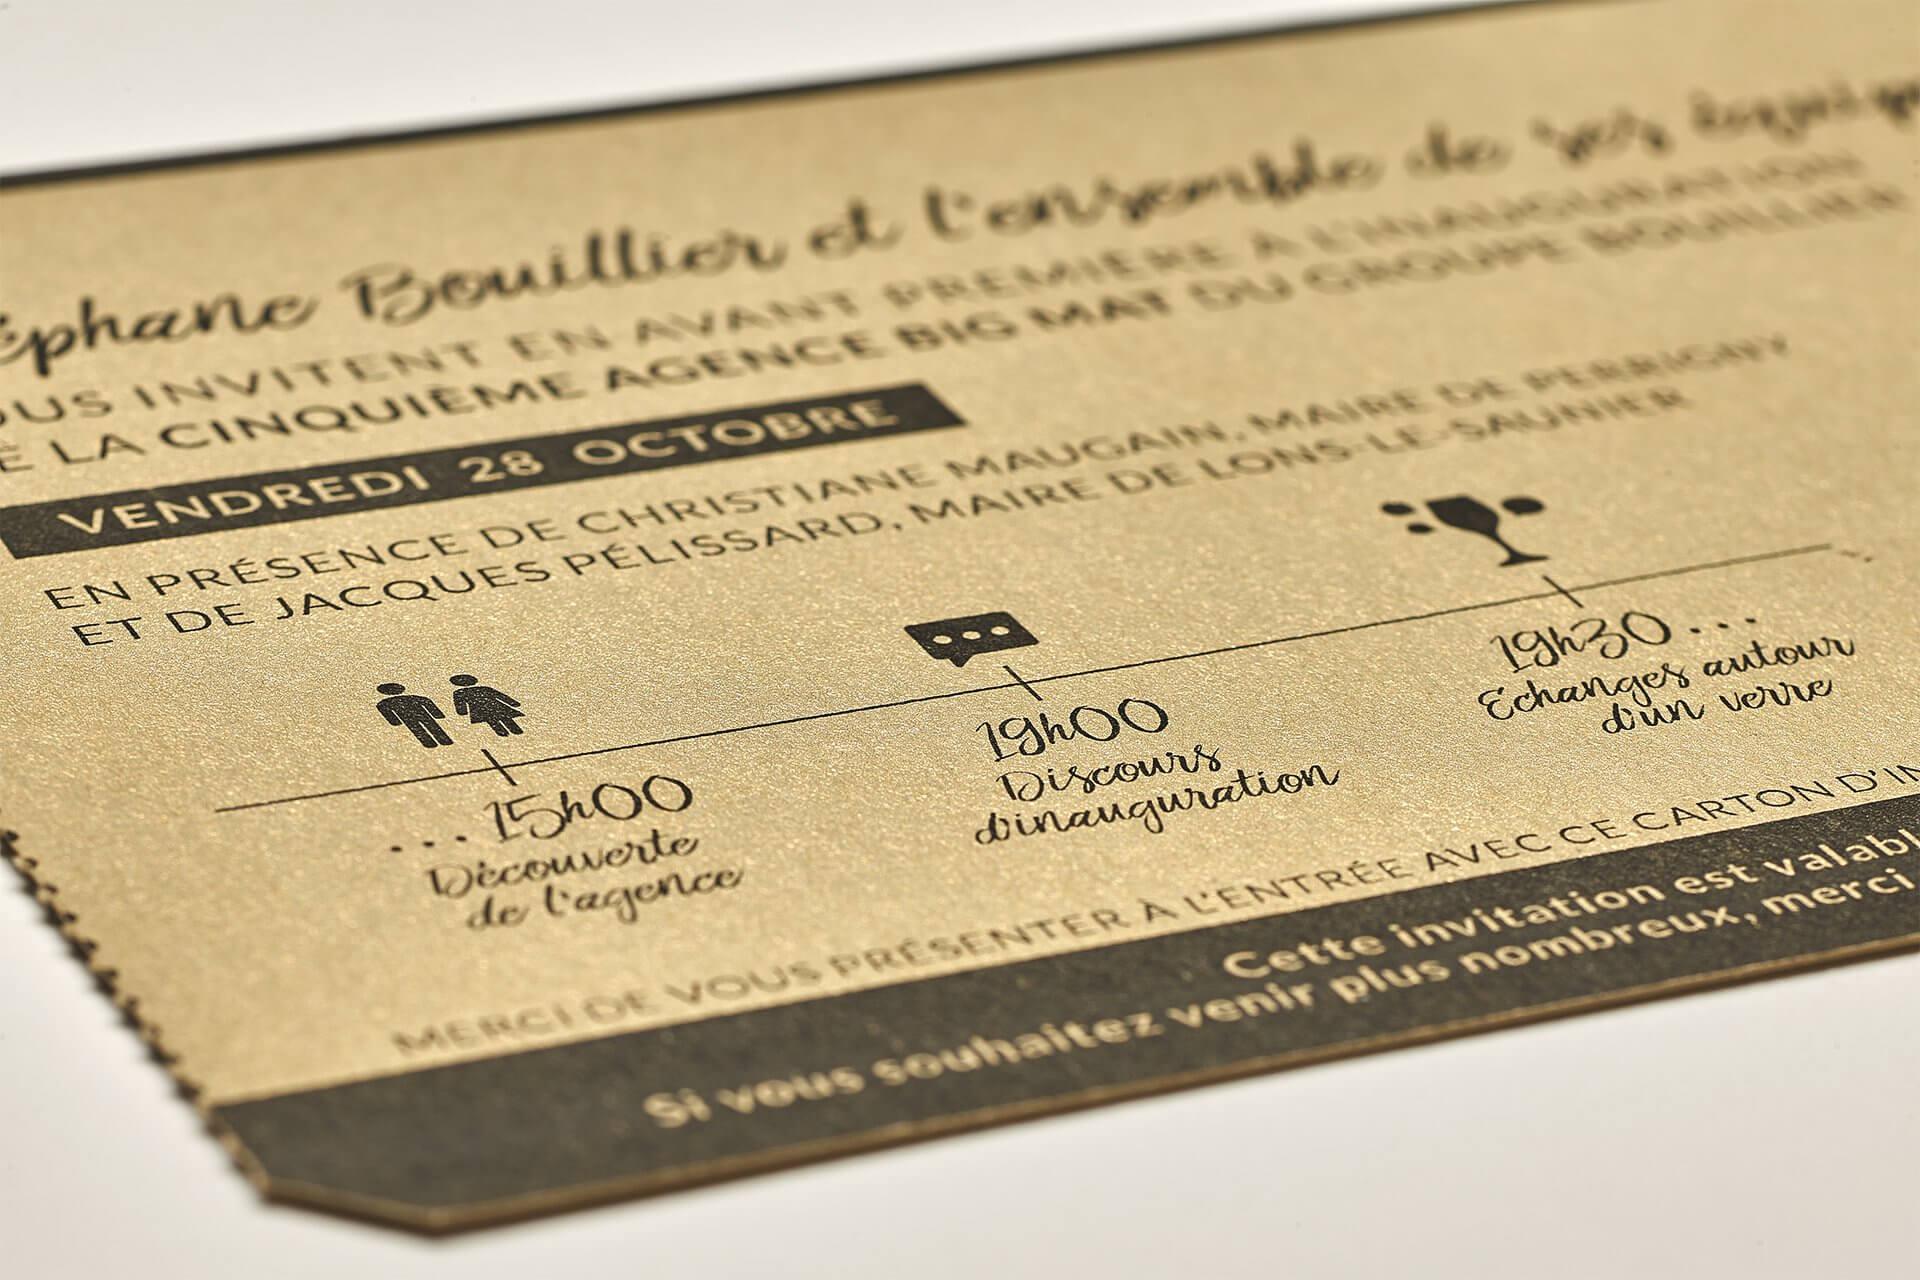 EUREKA - image document print Bouillier